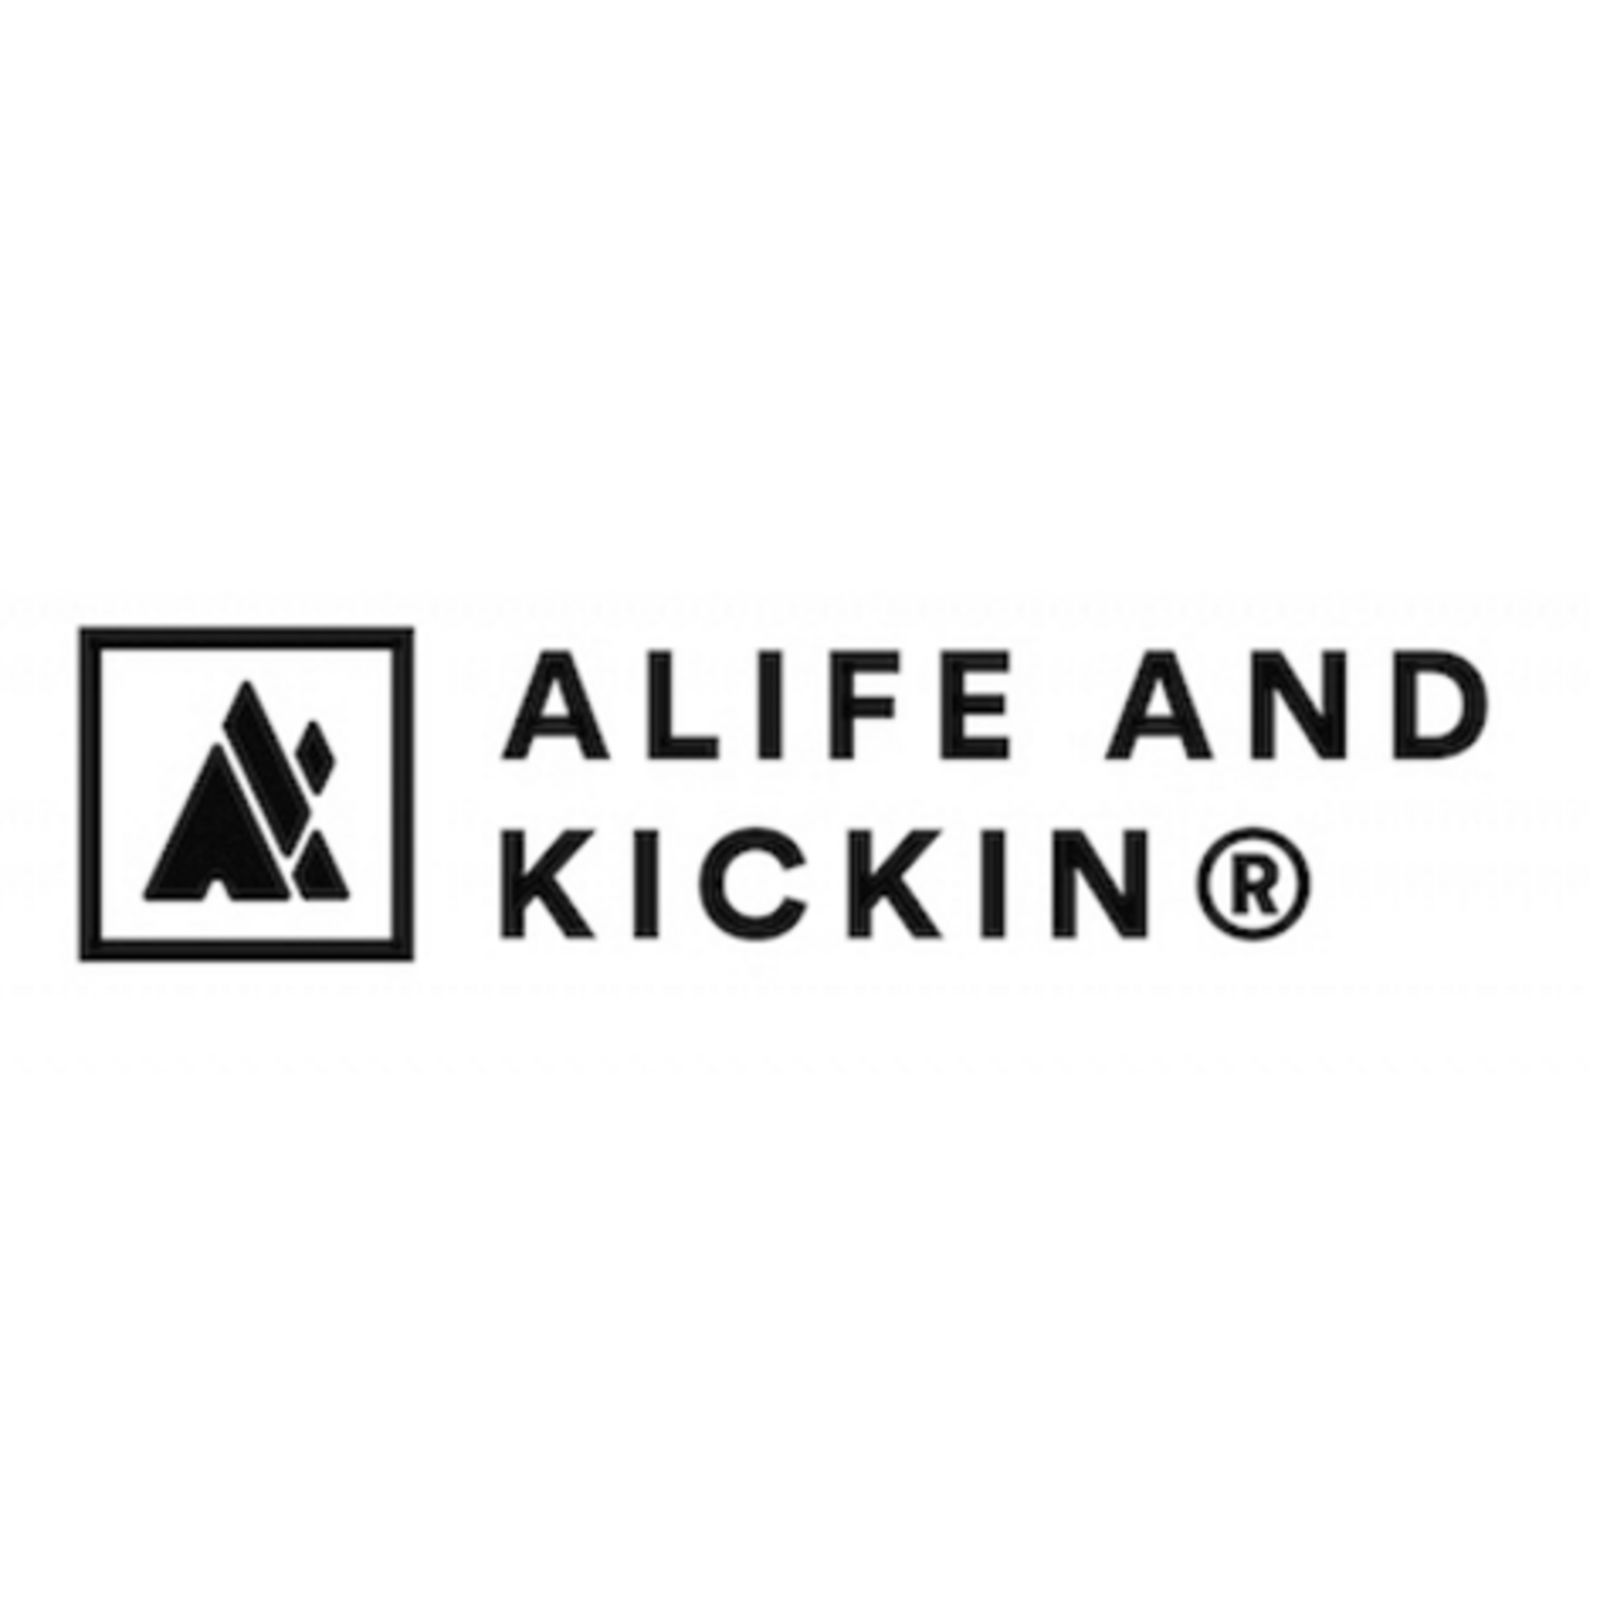 ALIFE AND KICKIN®